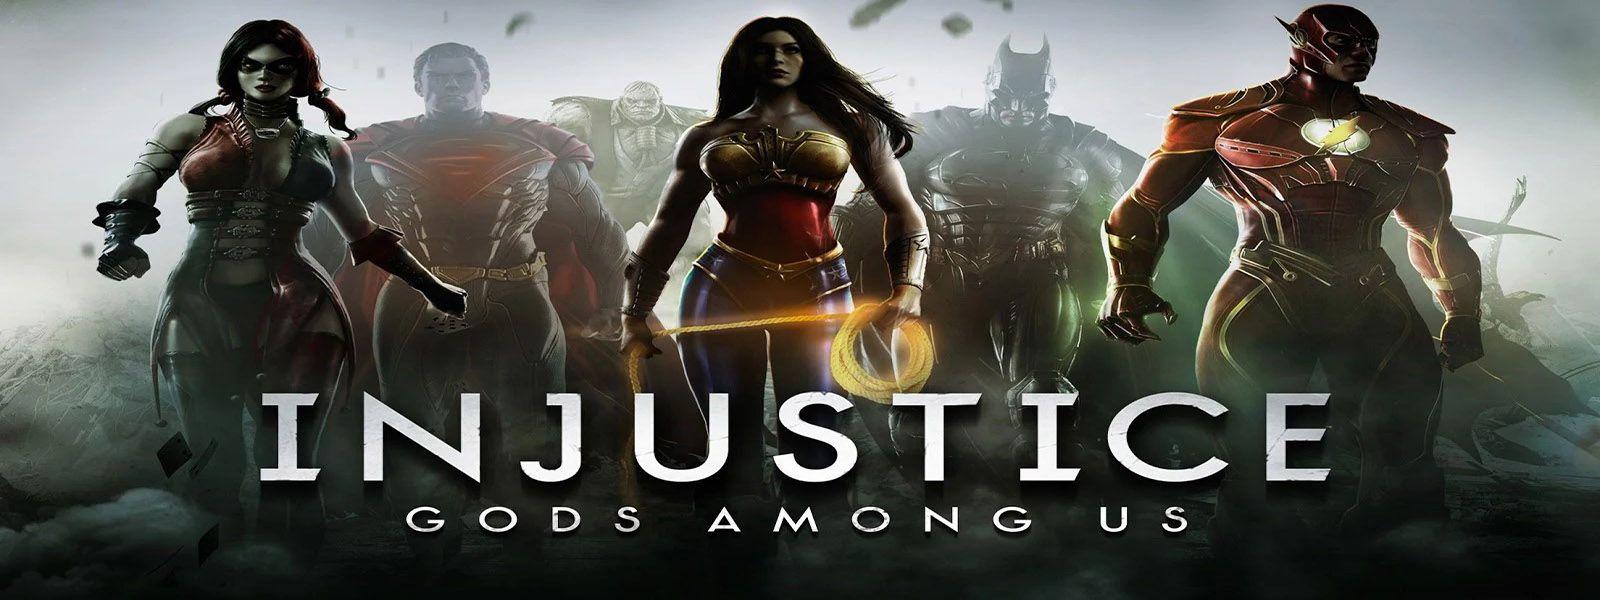 Online Generators Video Games Dc injustice, God, Cheating